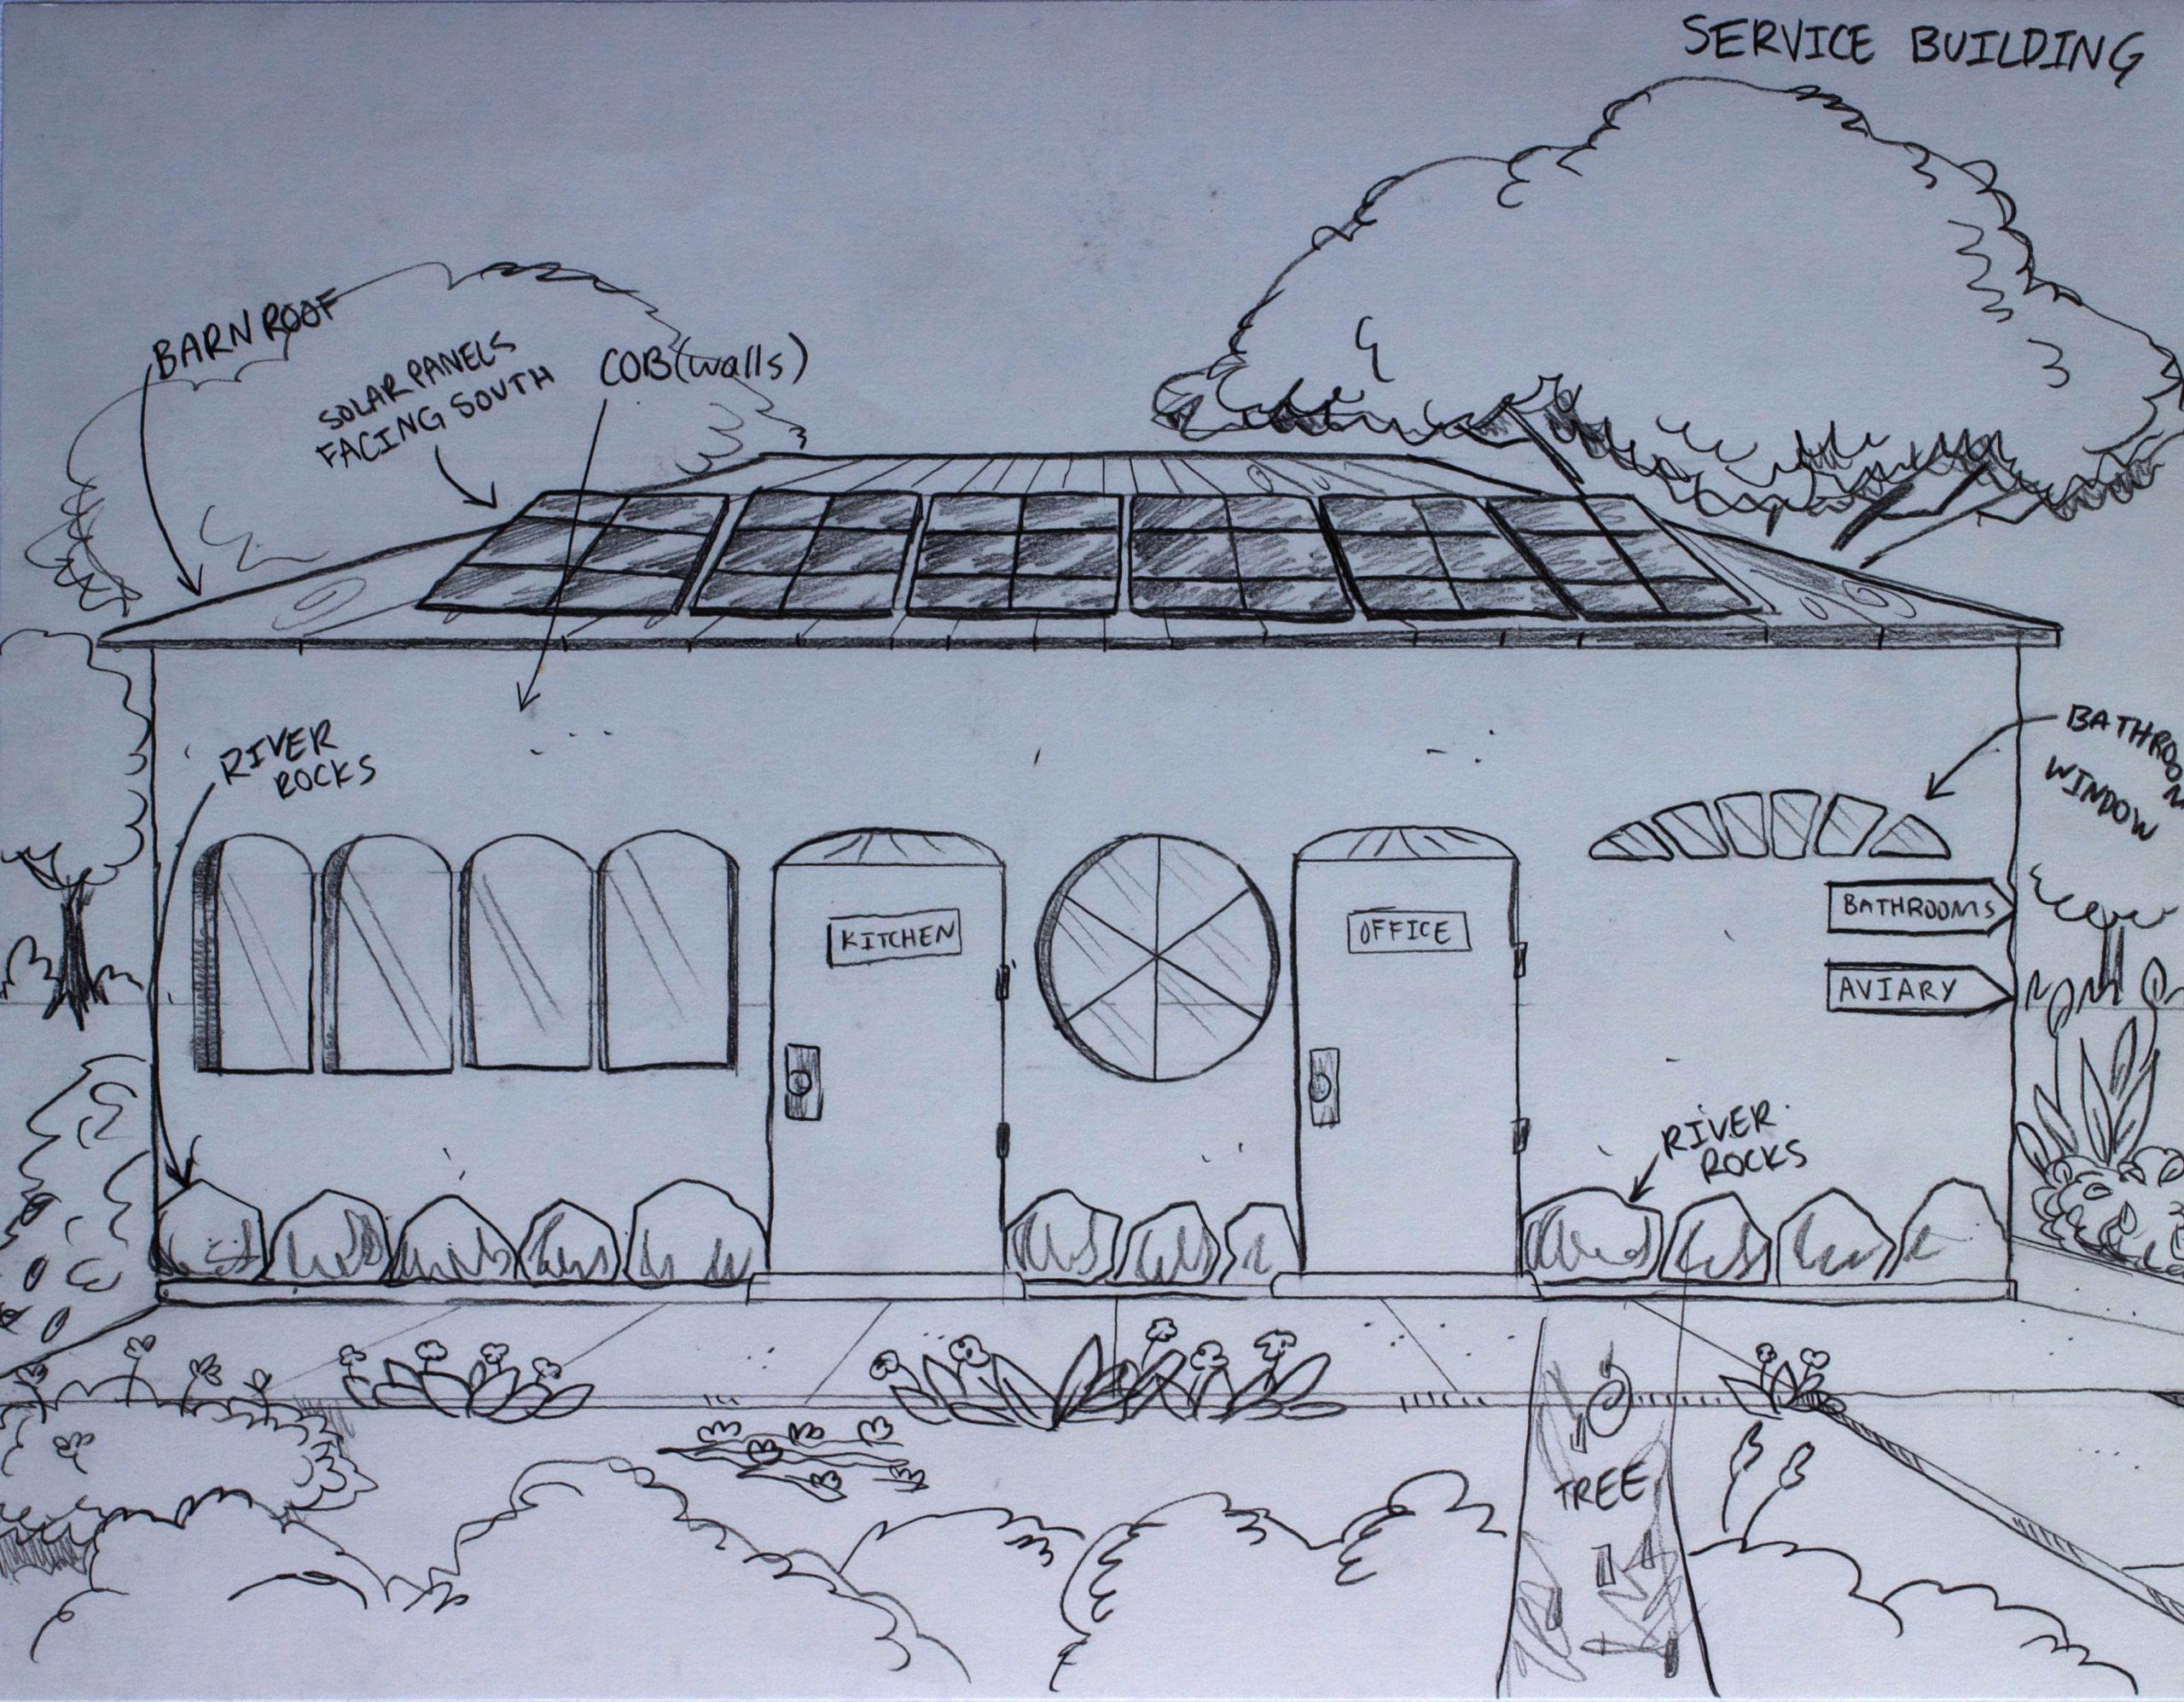 9 Service Building Enlarged Plan